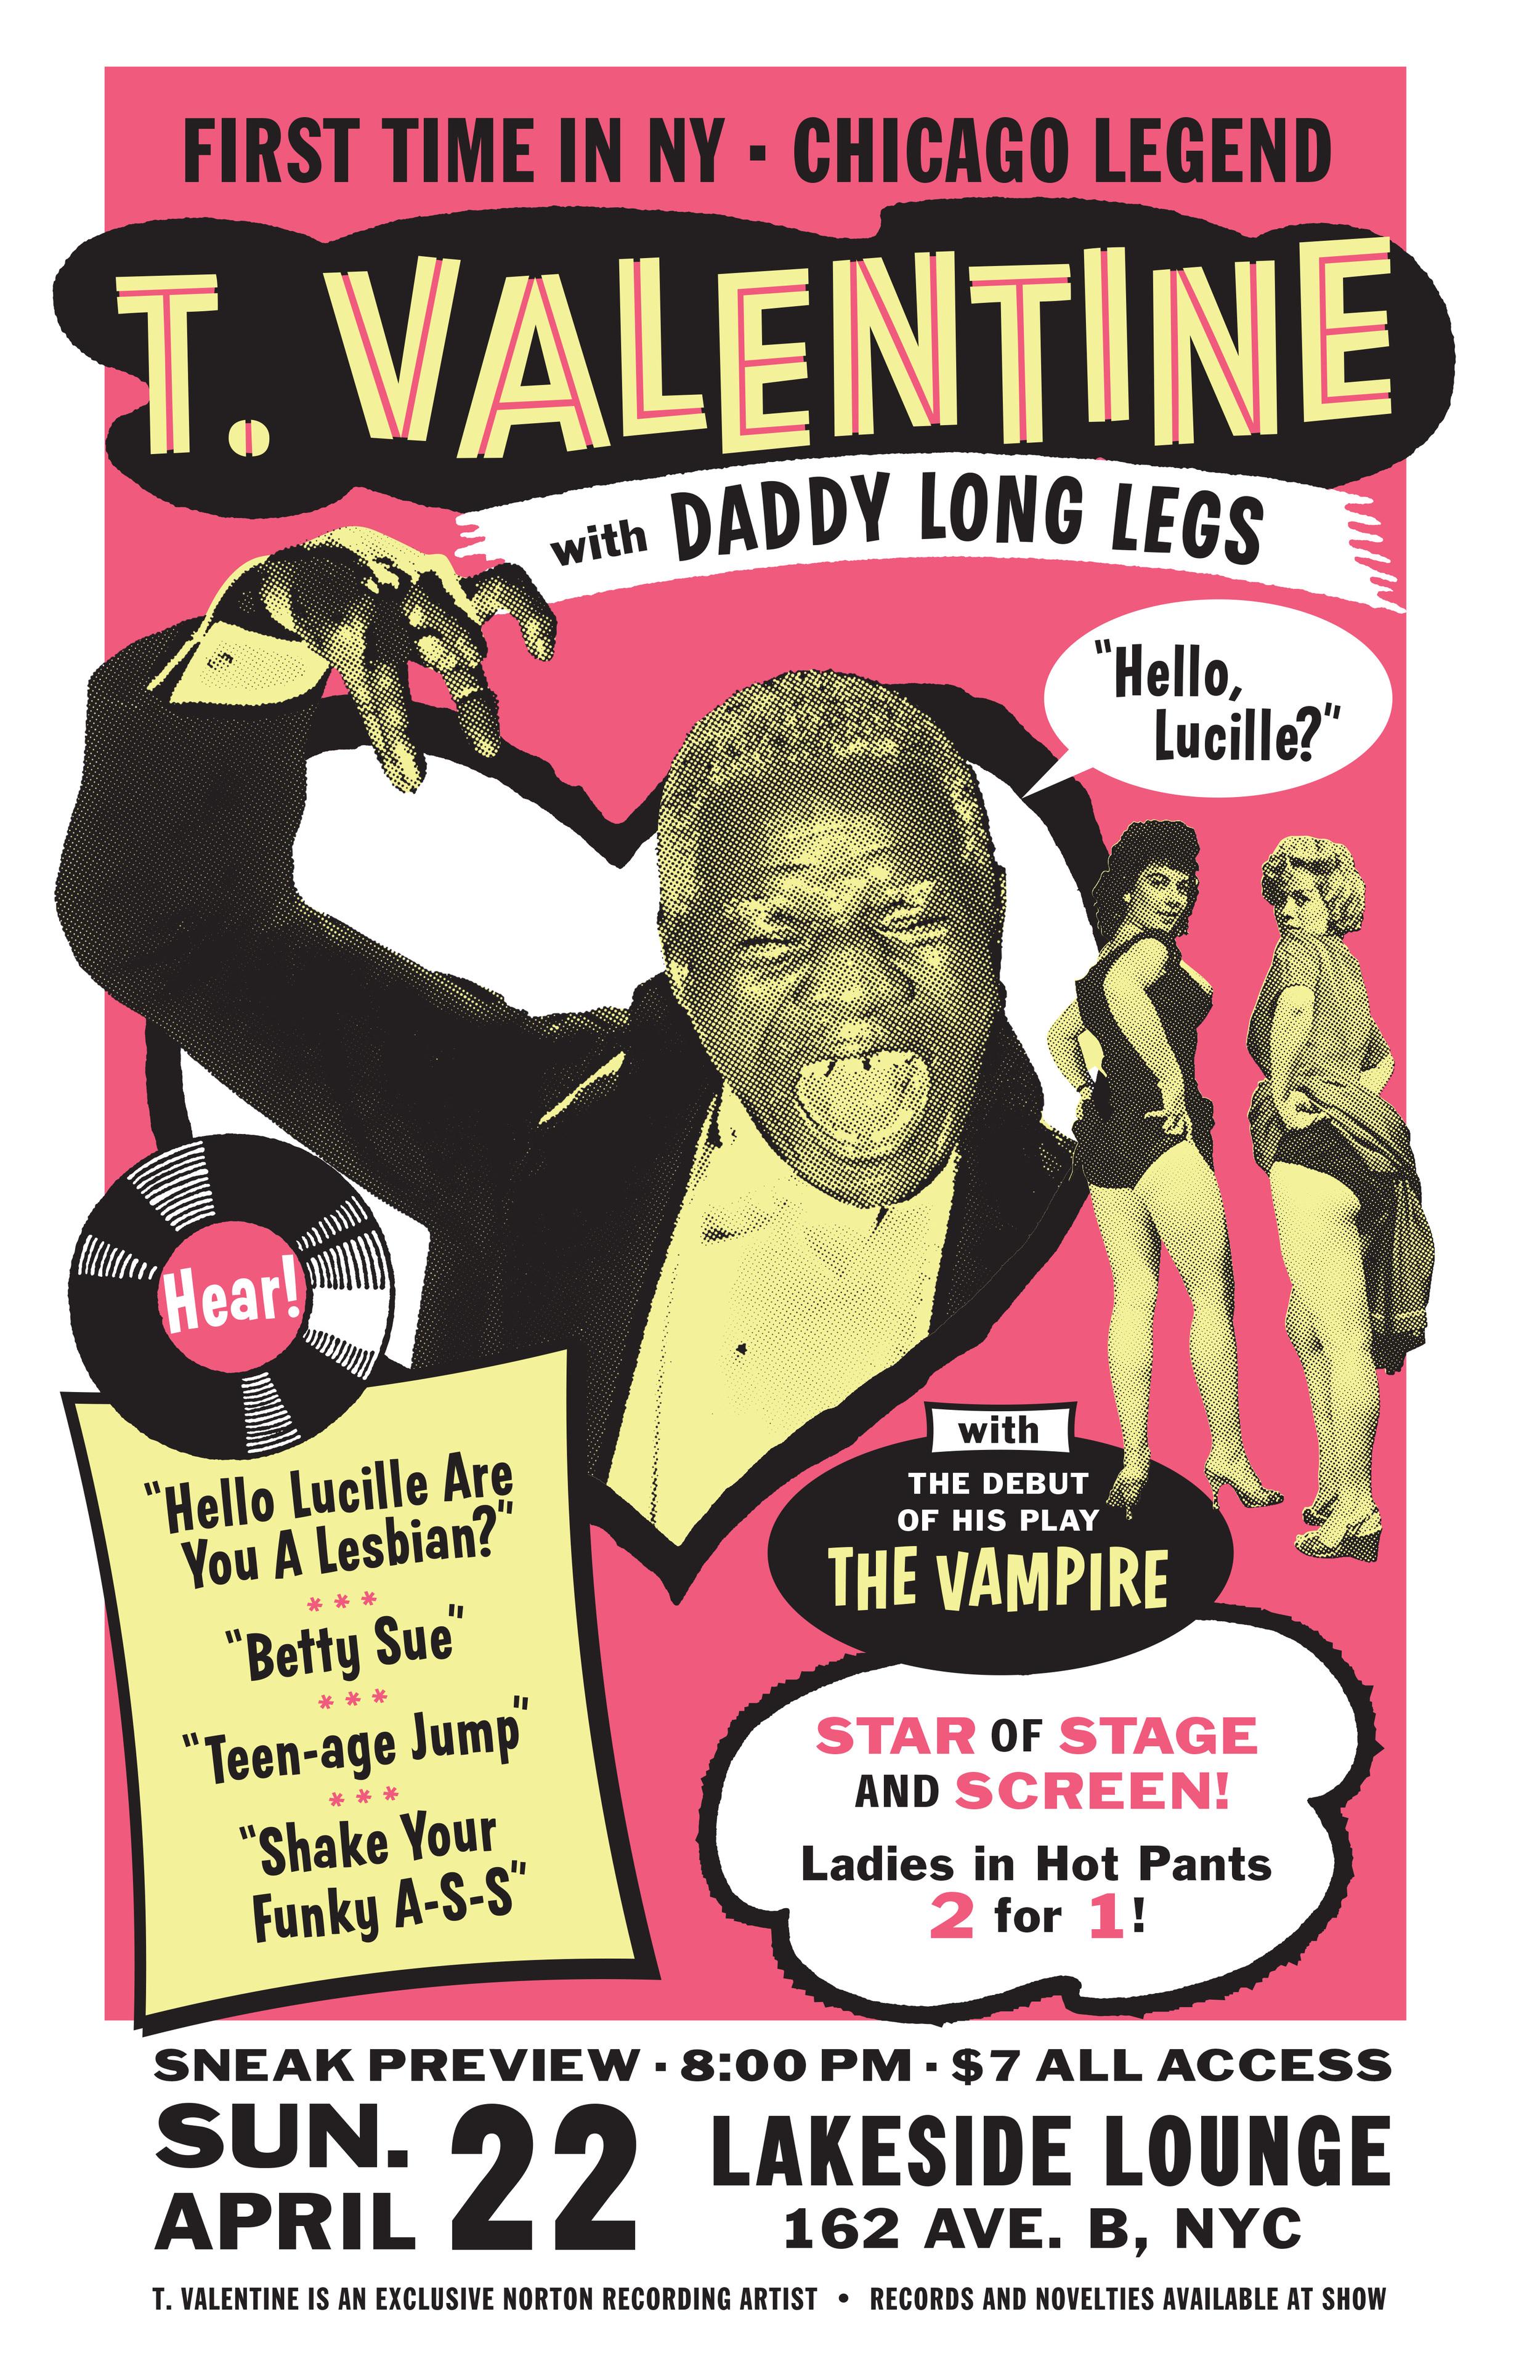 T. Valentine concert poster